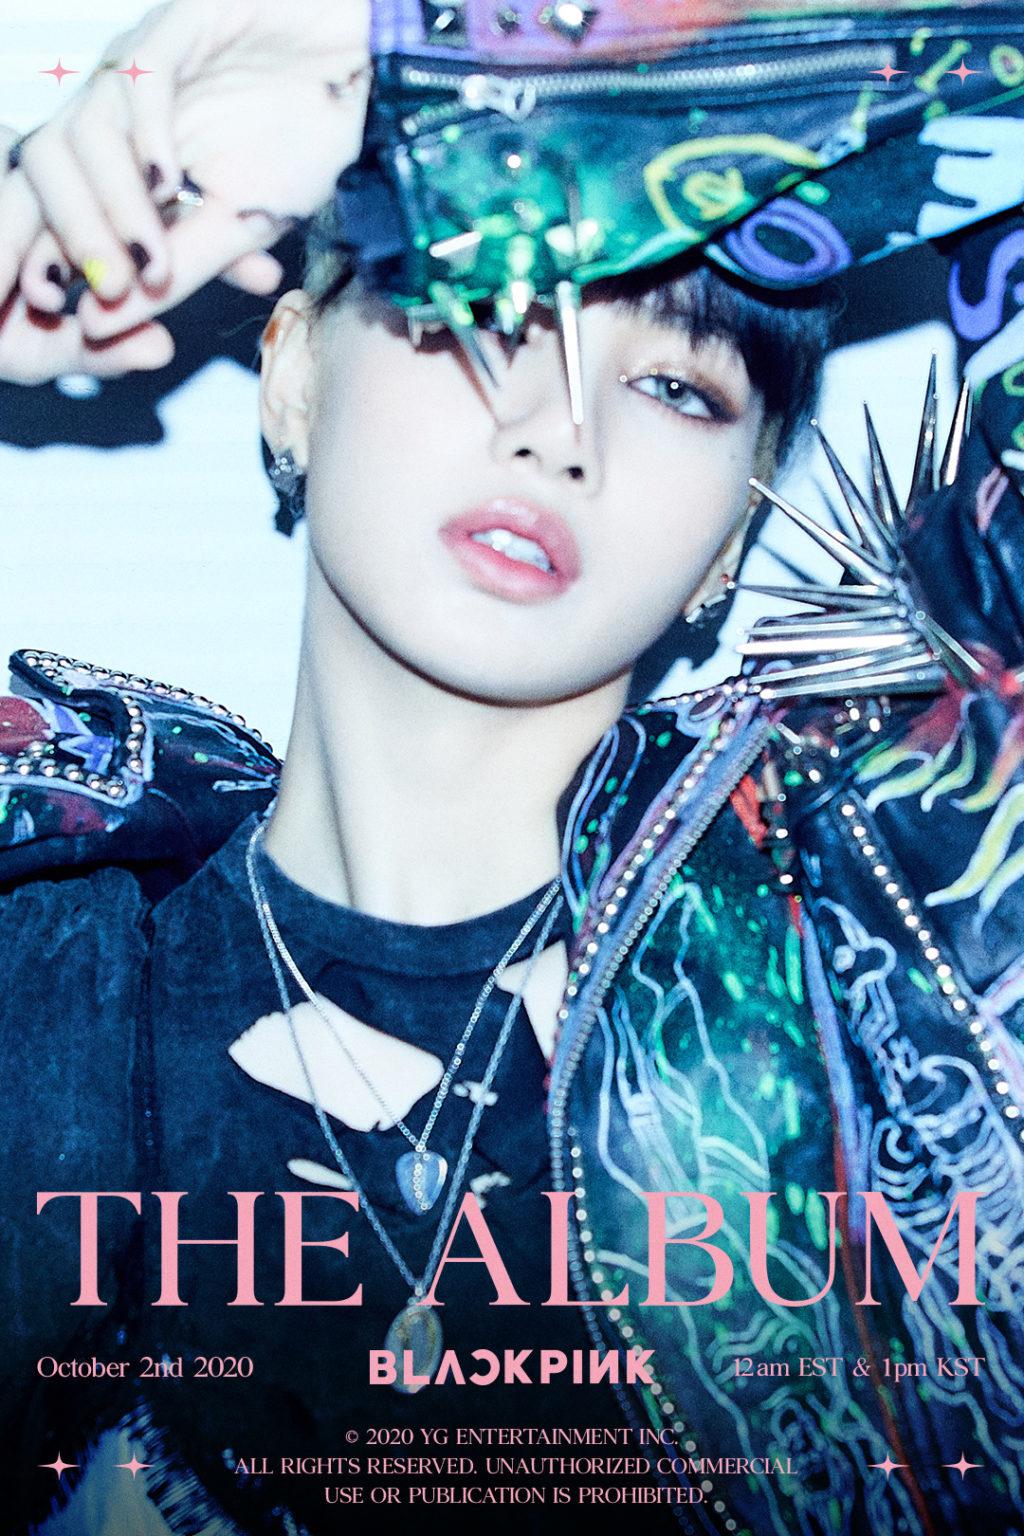 BLACKPINK's Lisa Looks Fierce on 'THE ALBUM' Poster